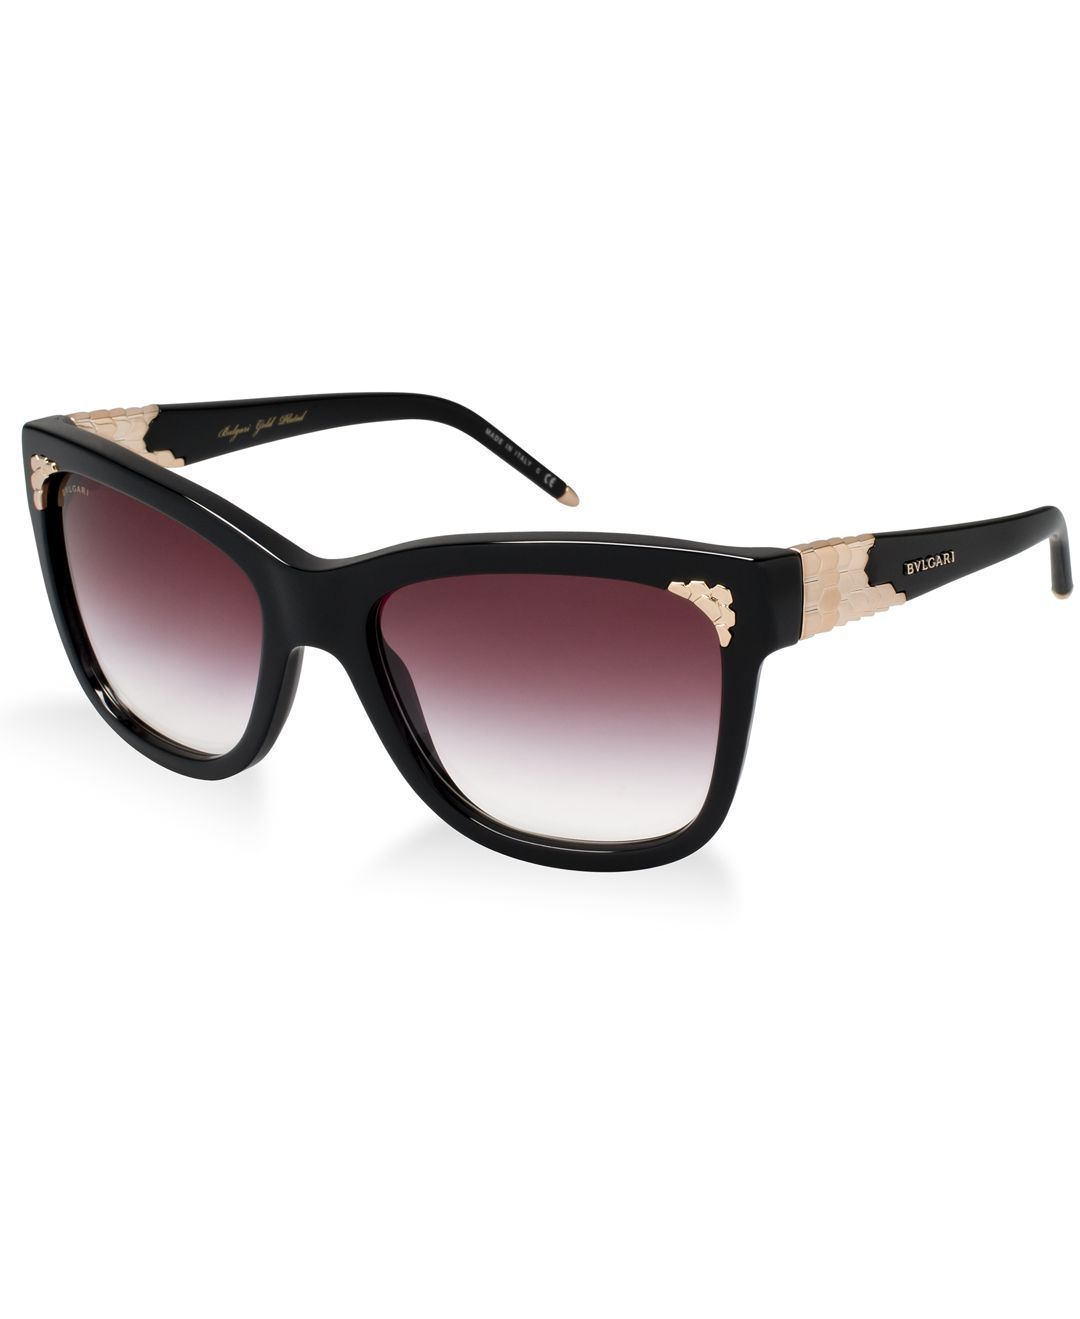 4b14f48fd0 Bvlgari Sunglasses